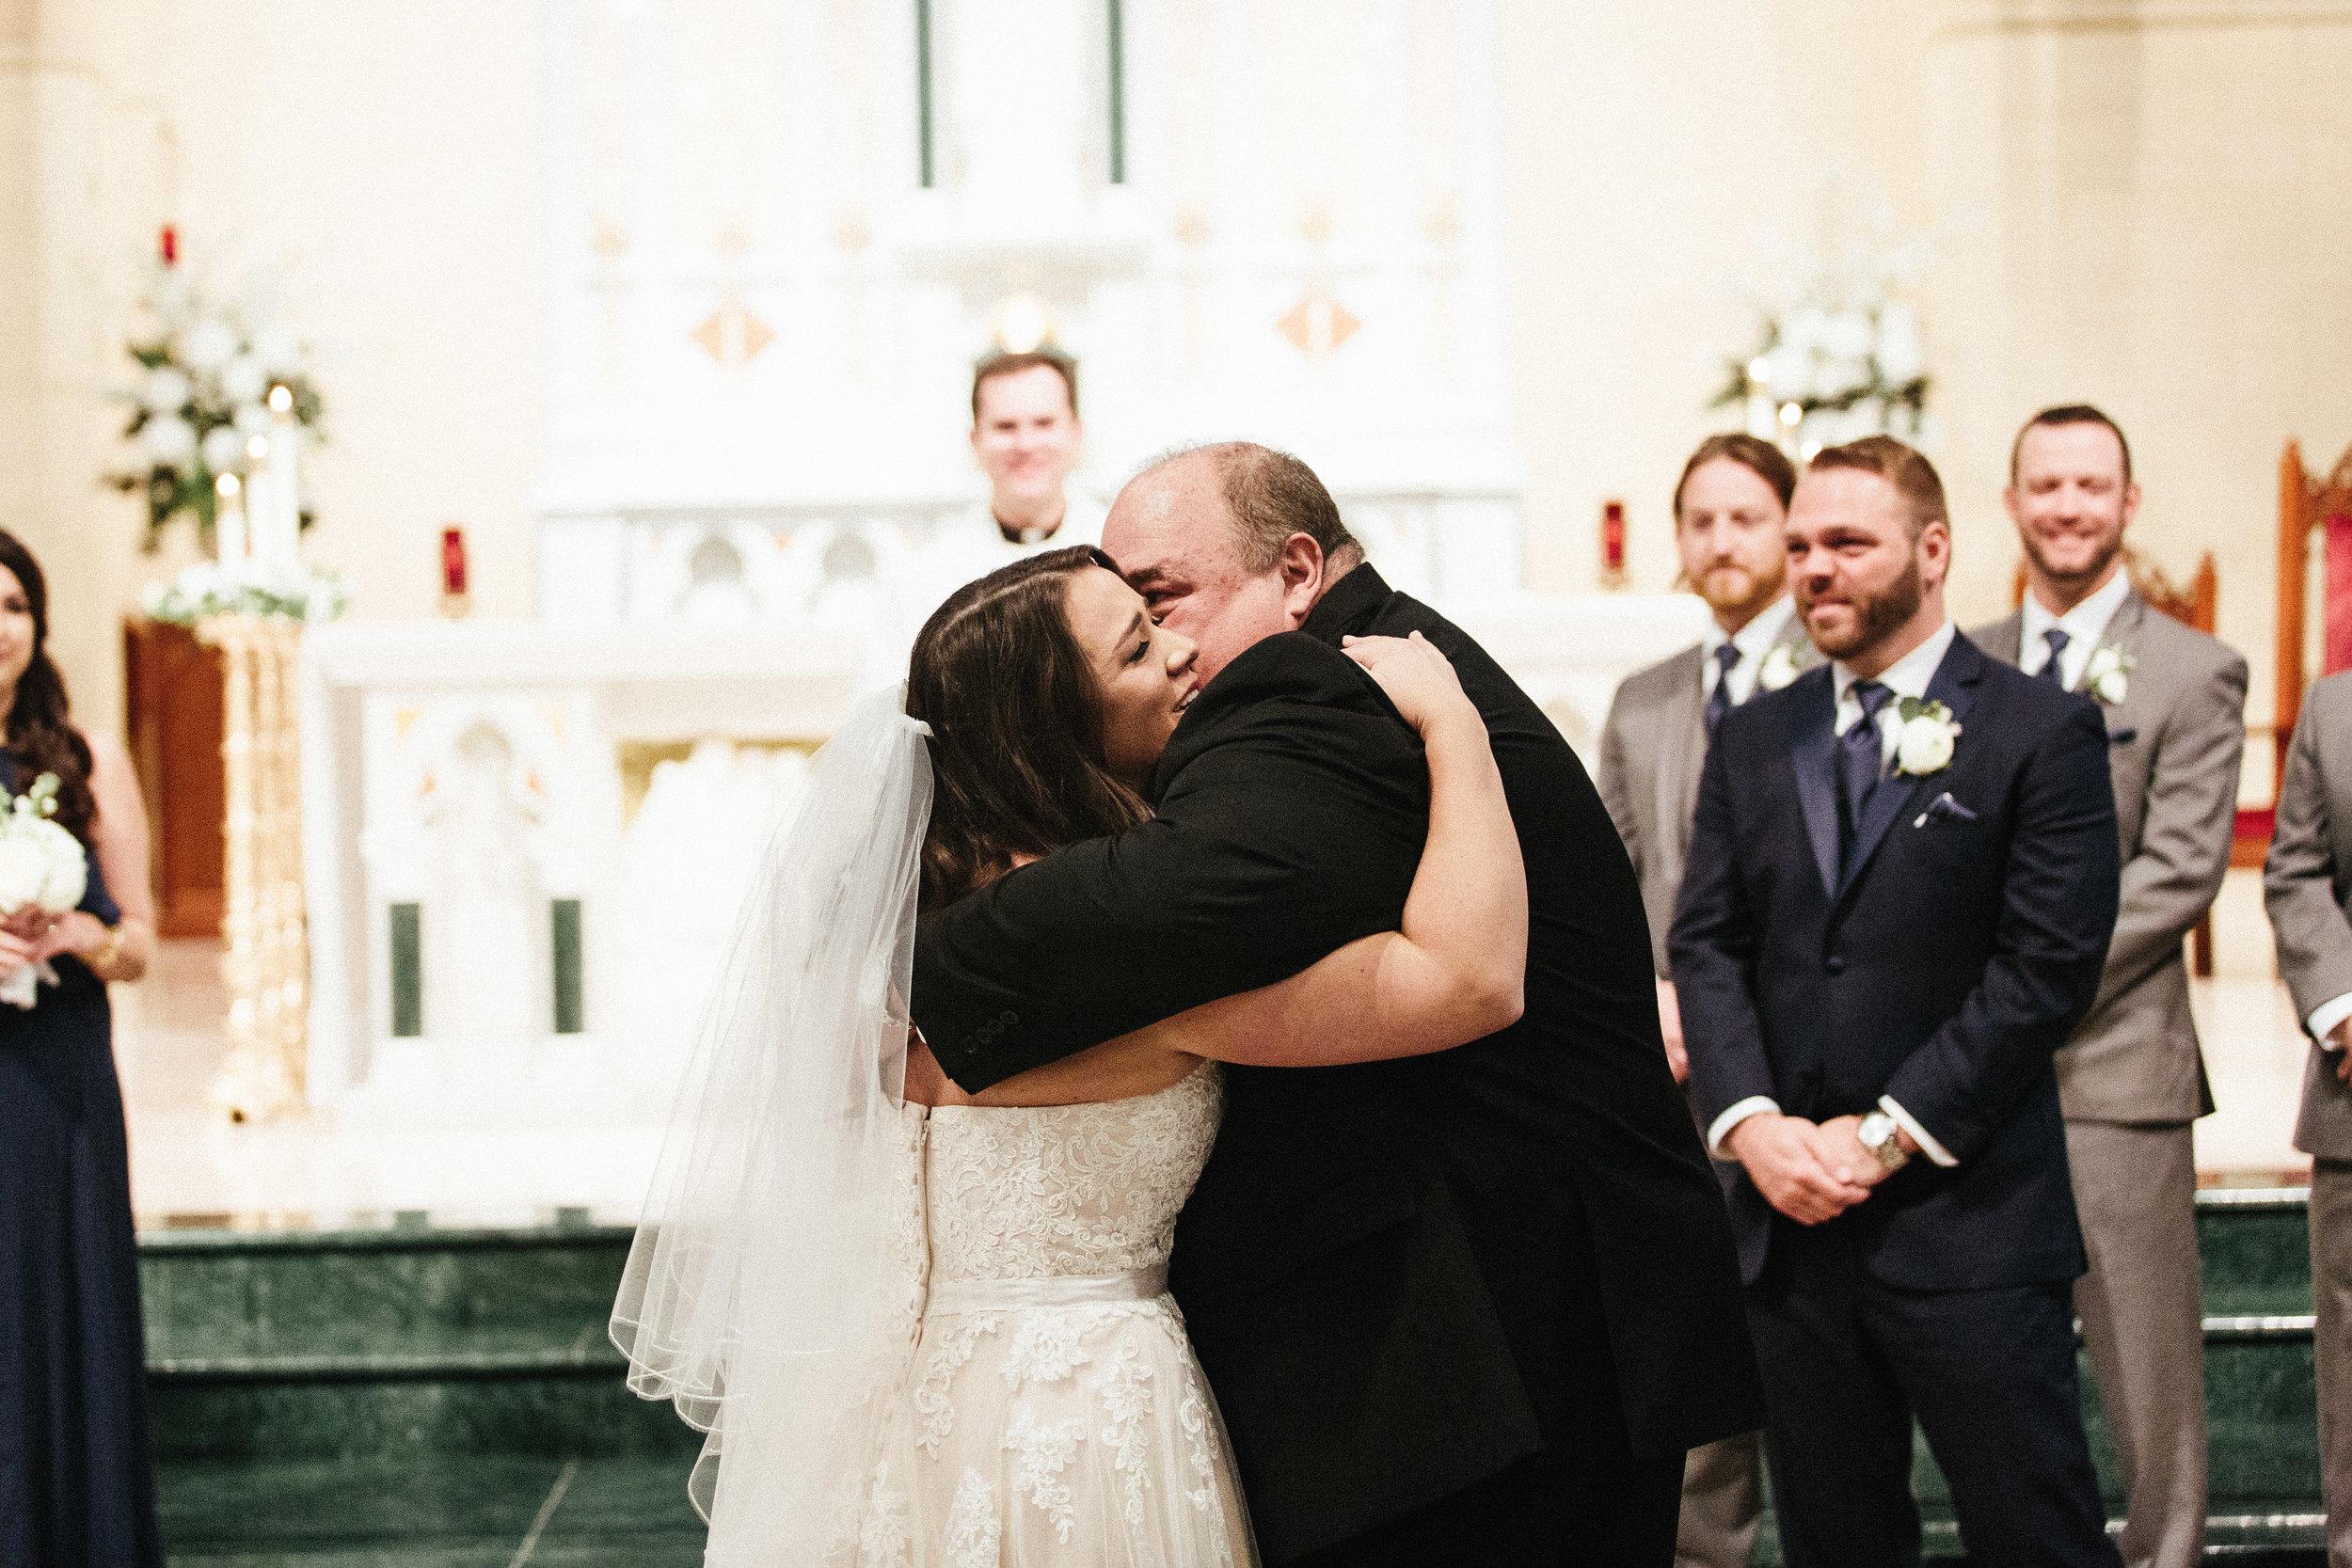 roswell_st_peter_chanel_catholic_avalon_hotel_alpharetta_wedding-1448.jpg